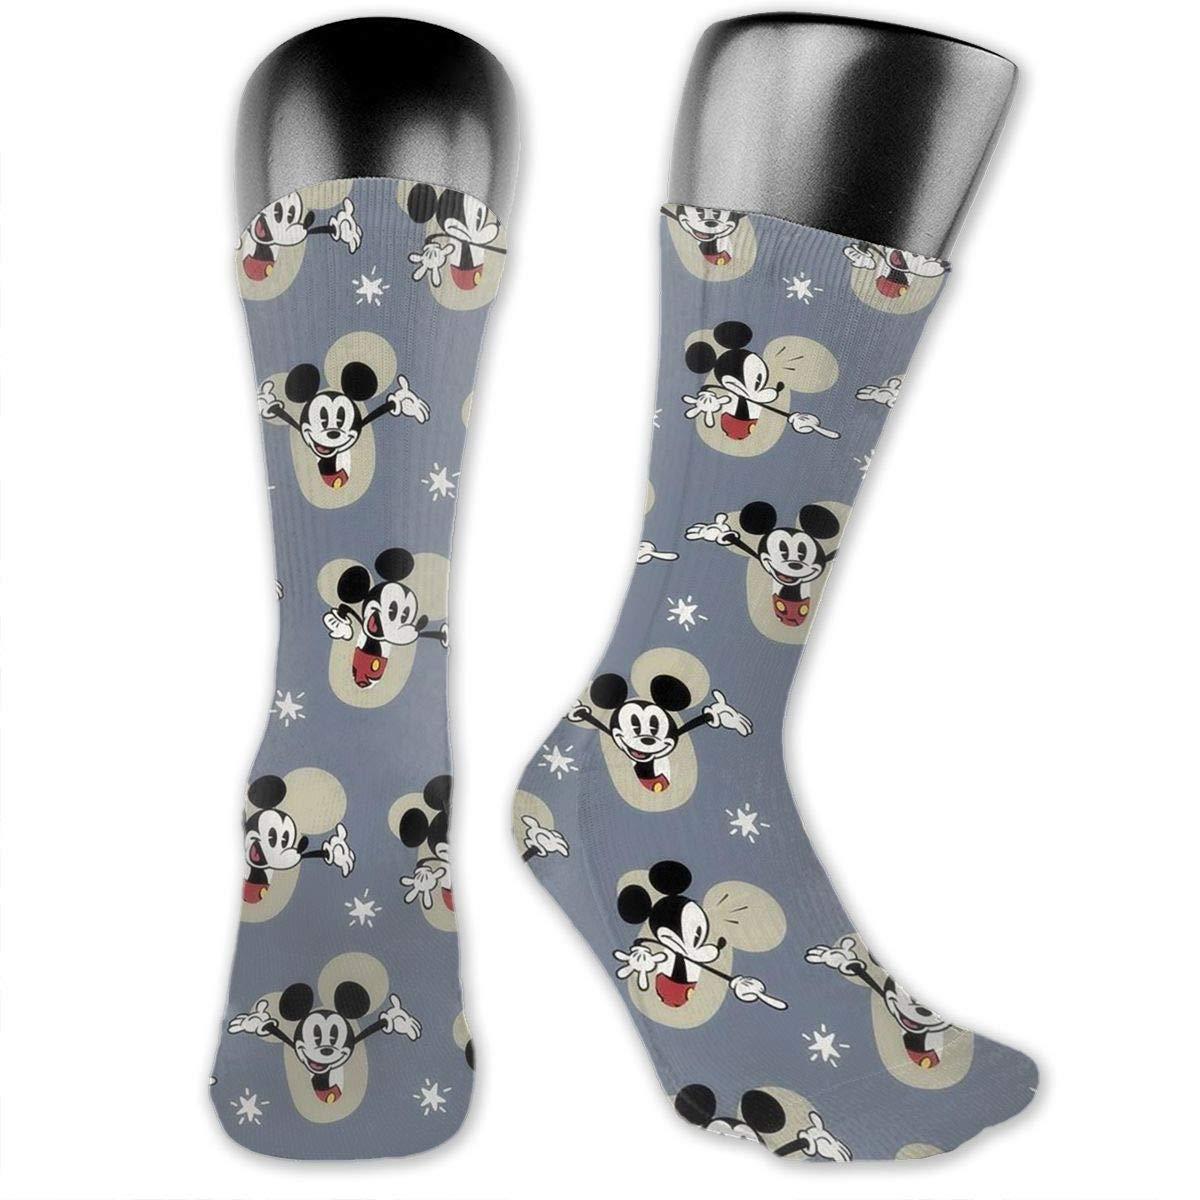 80b9e4375f7 Amazon.com  CFECUP Long Tube Stockings Disney Mickey Mouse Long Crew Tube  Socks Unisex Outdoor  Home   Kitchen